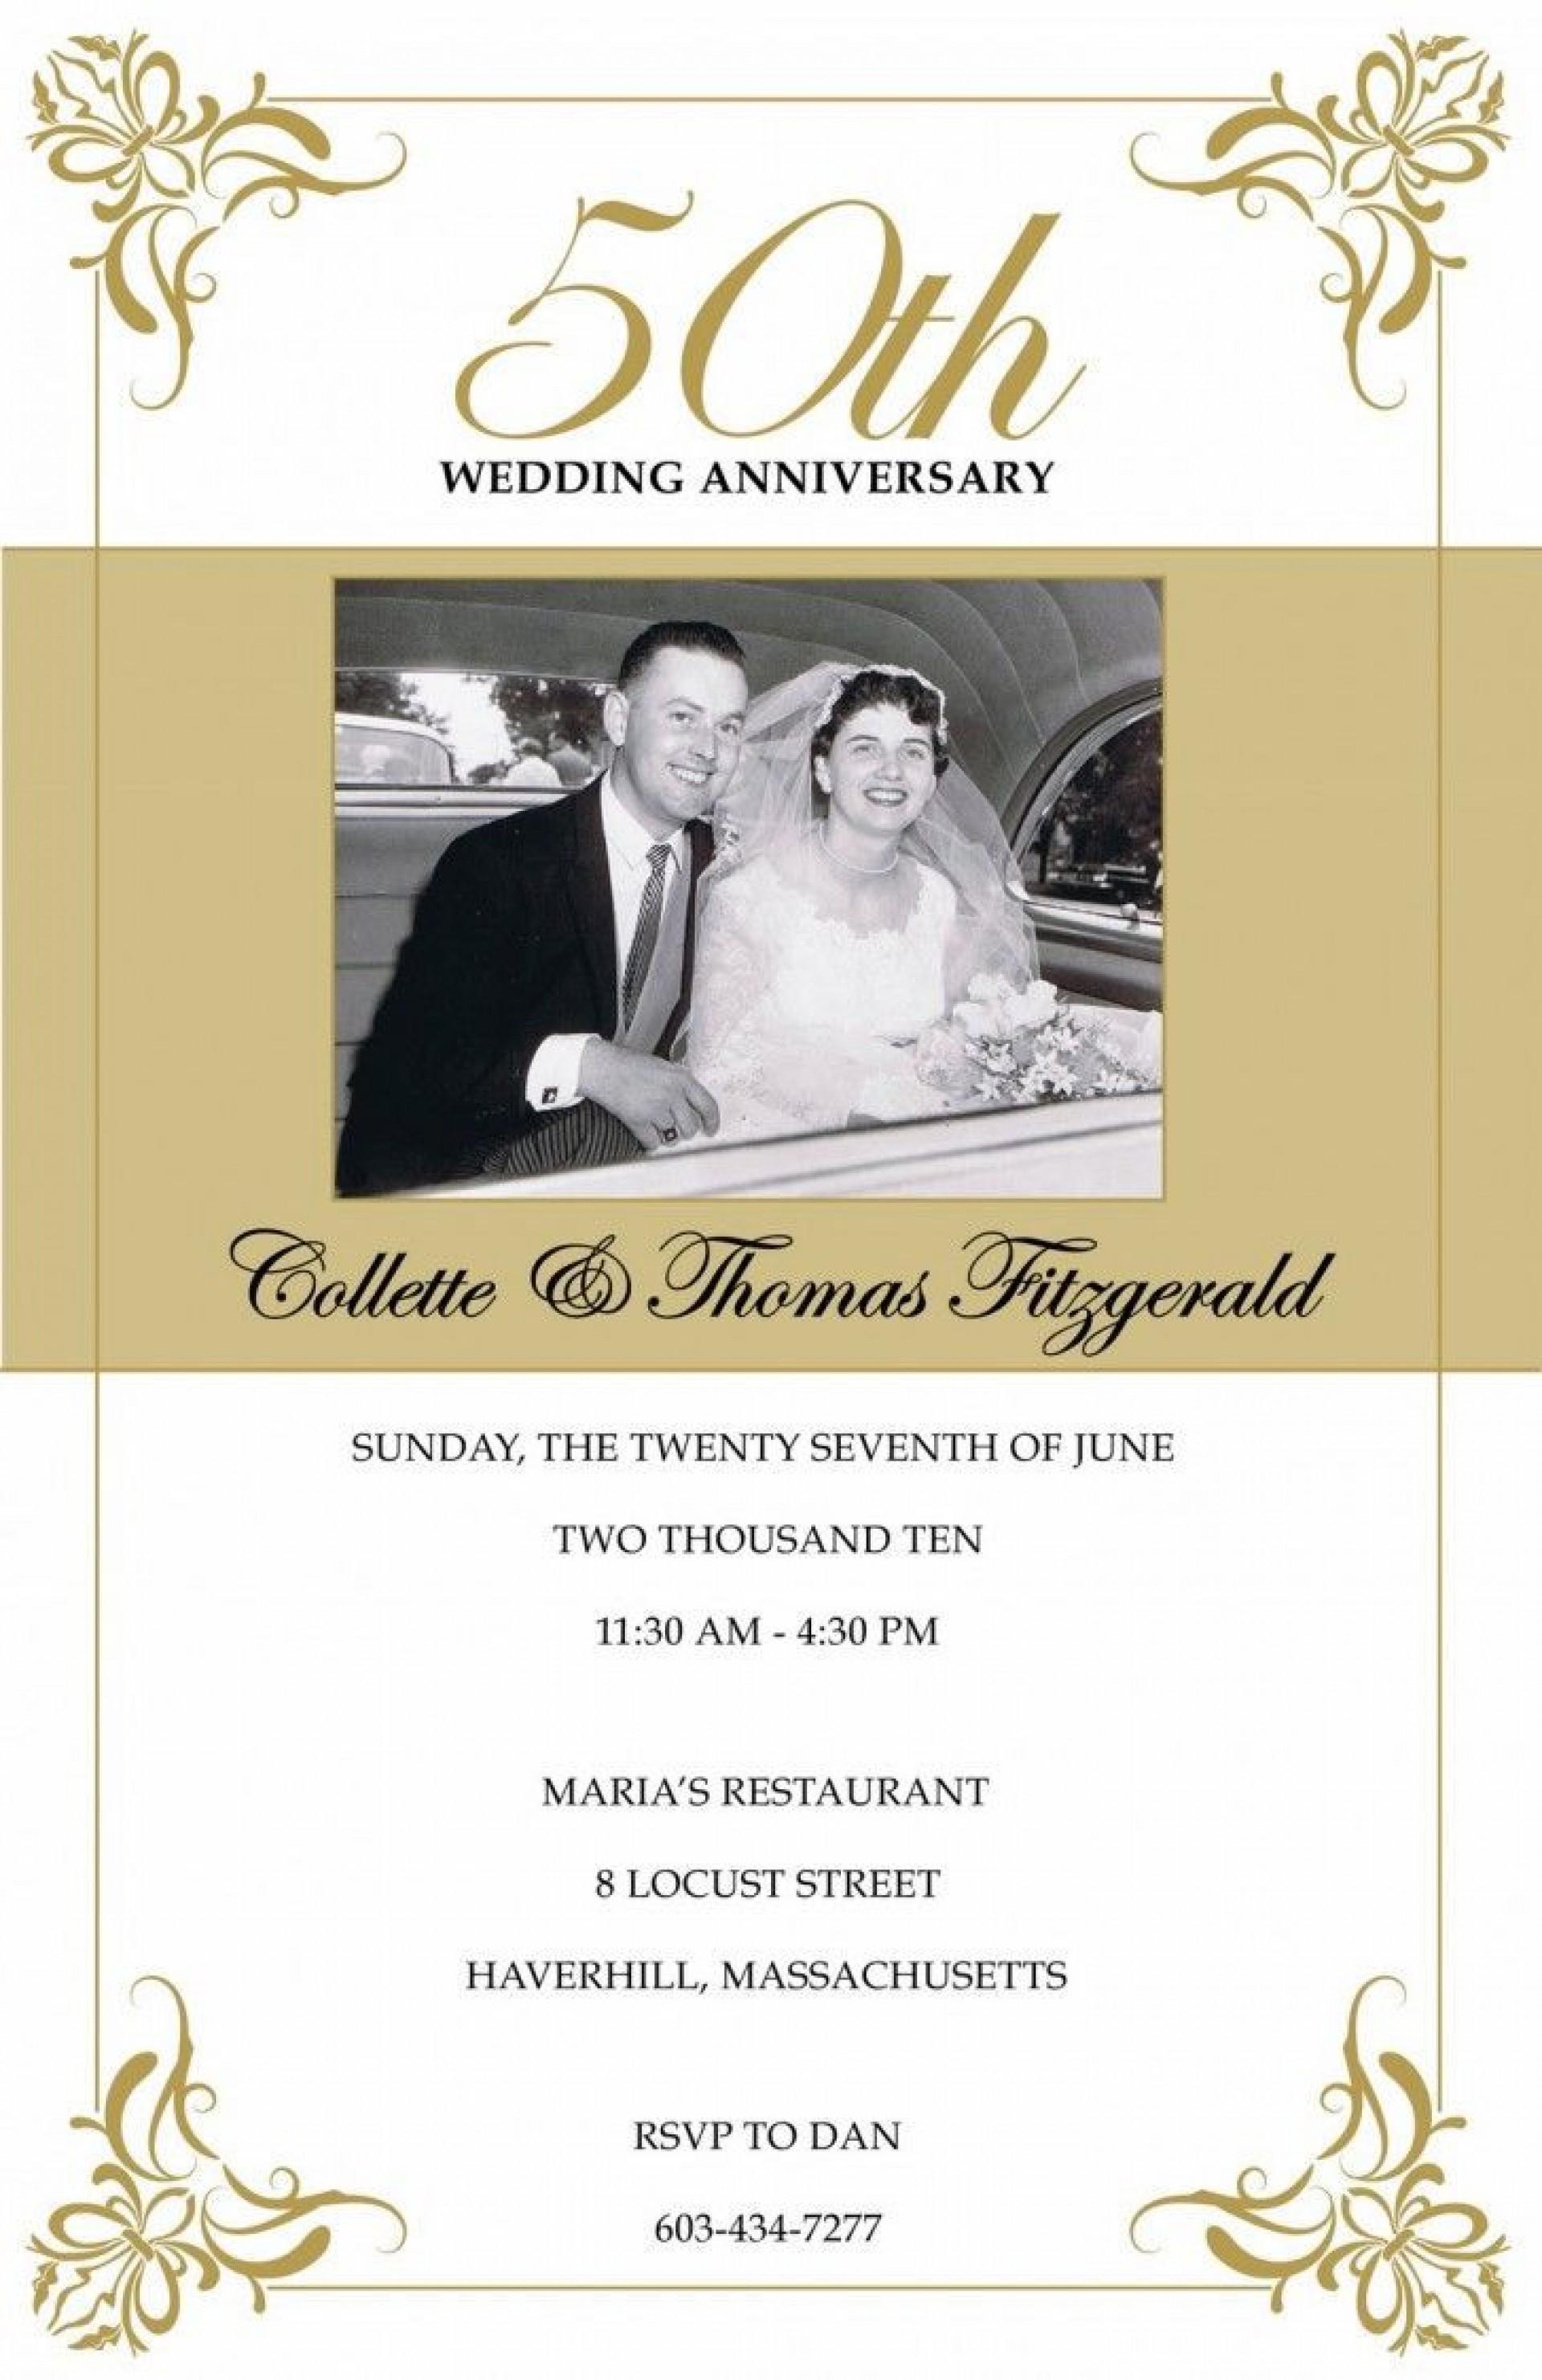 006 Wonderful 50th Wedding Anniversary Invitation Card Sample Concept  Wording1920